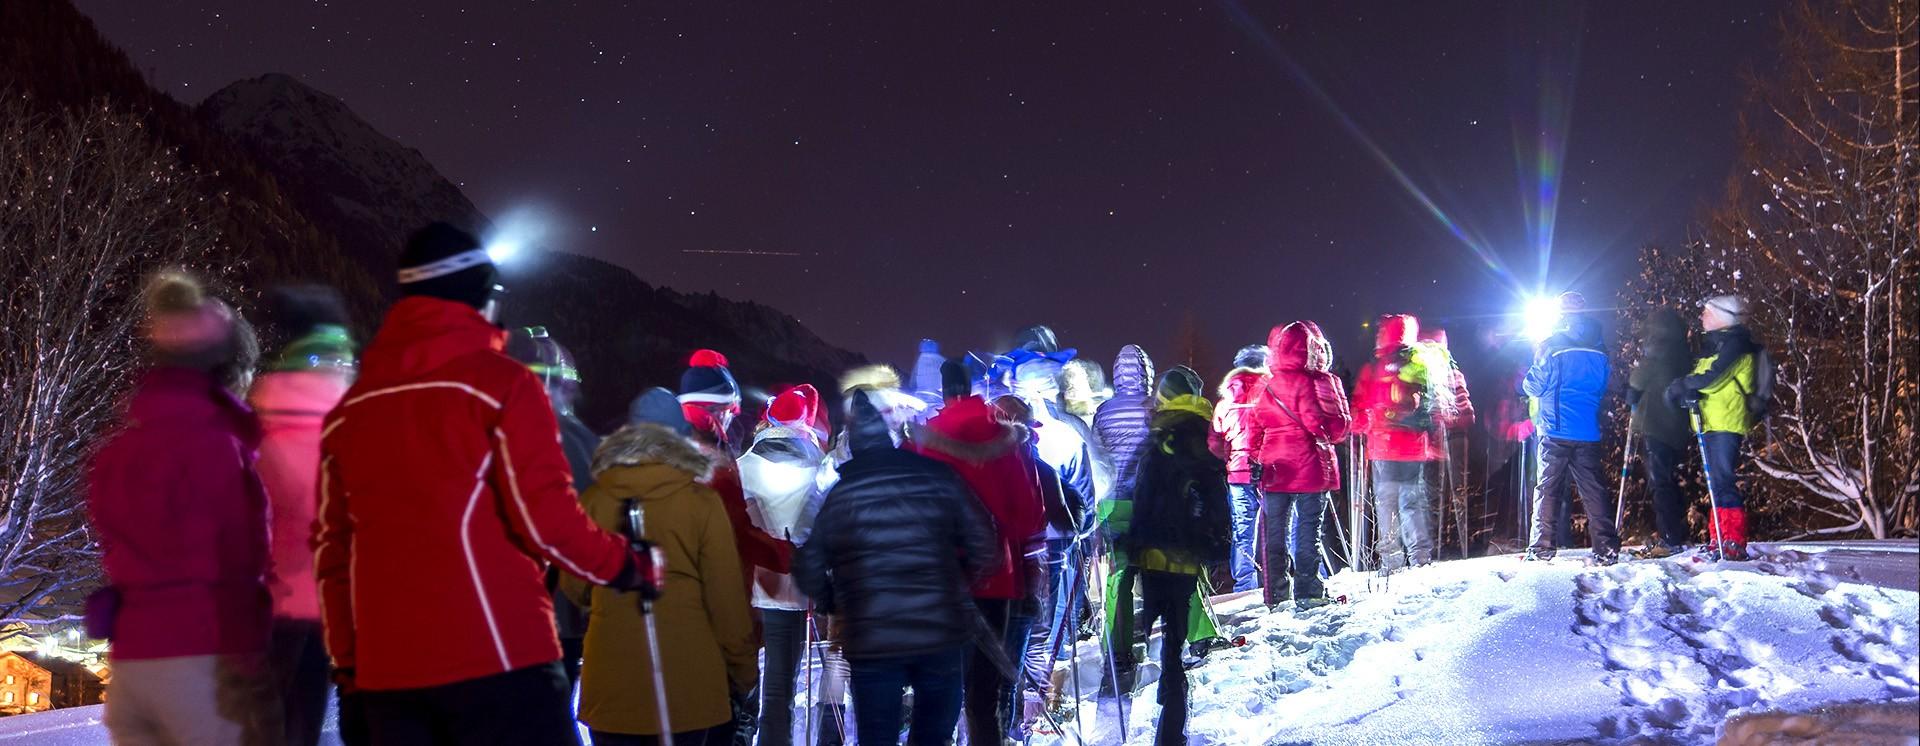 Evening - chamonix seminaires mont blanc